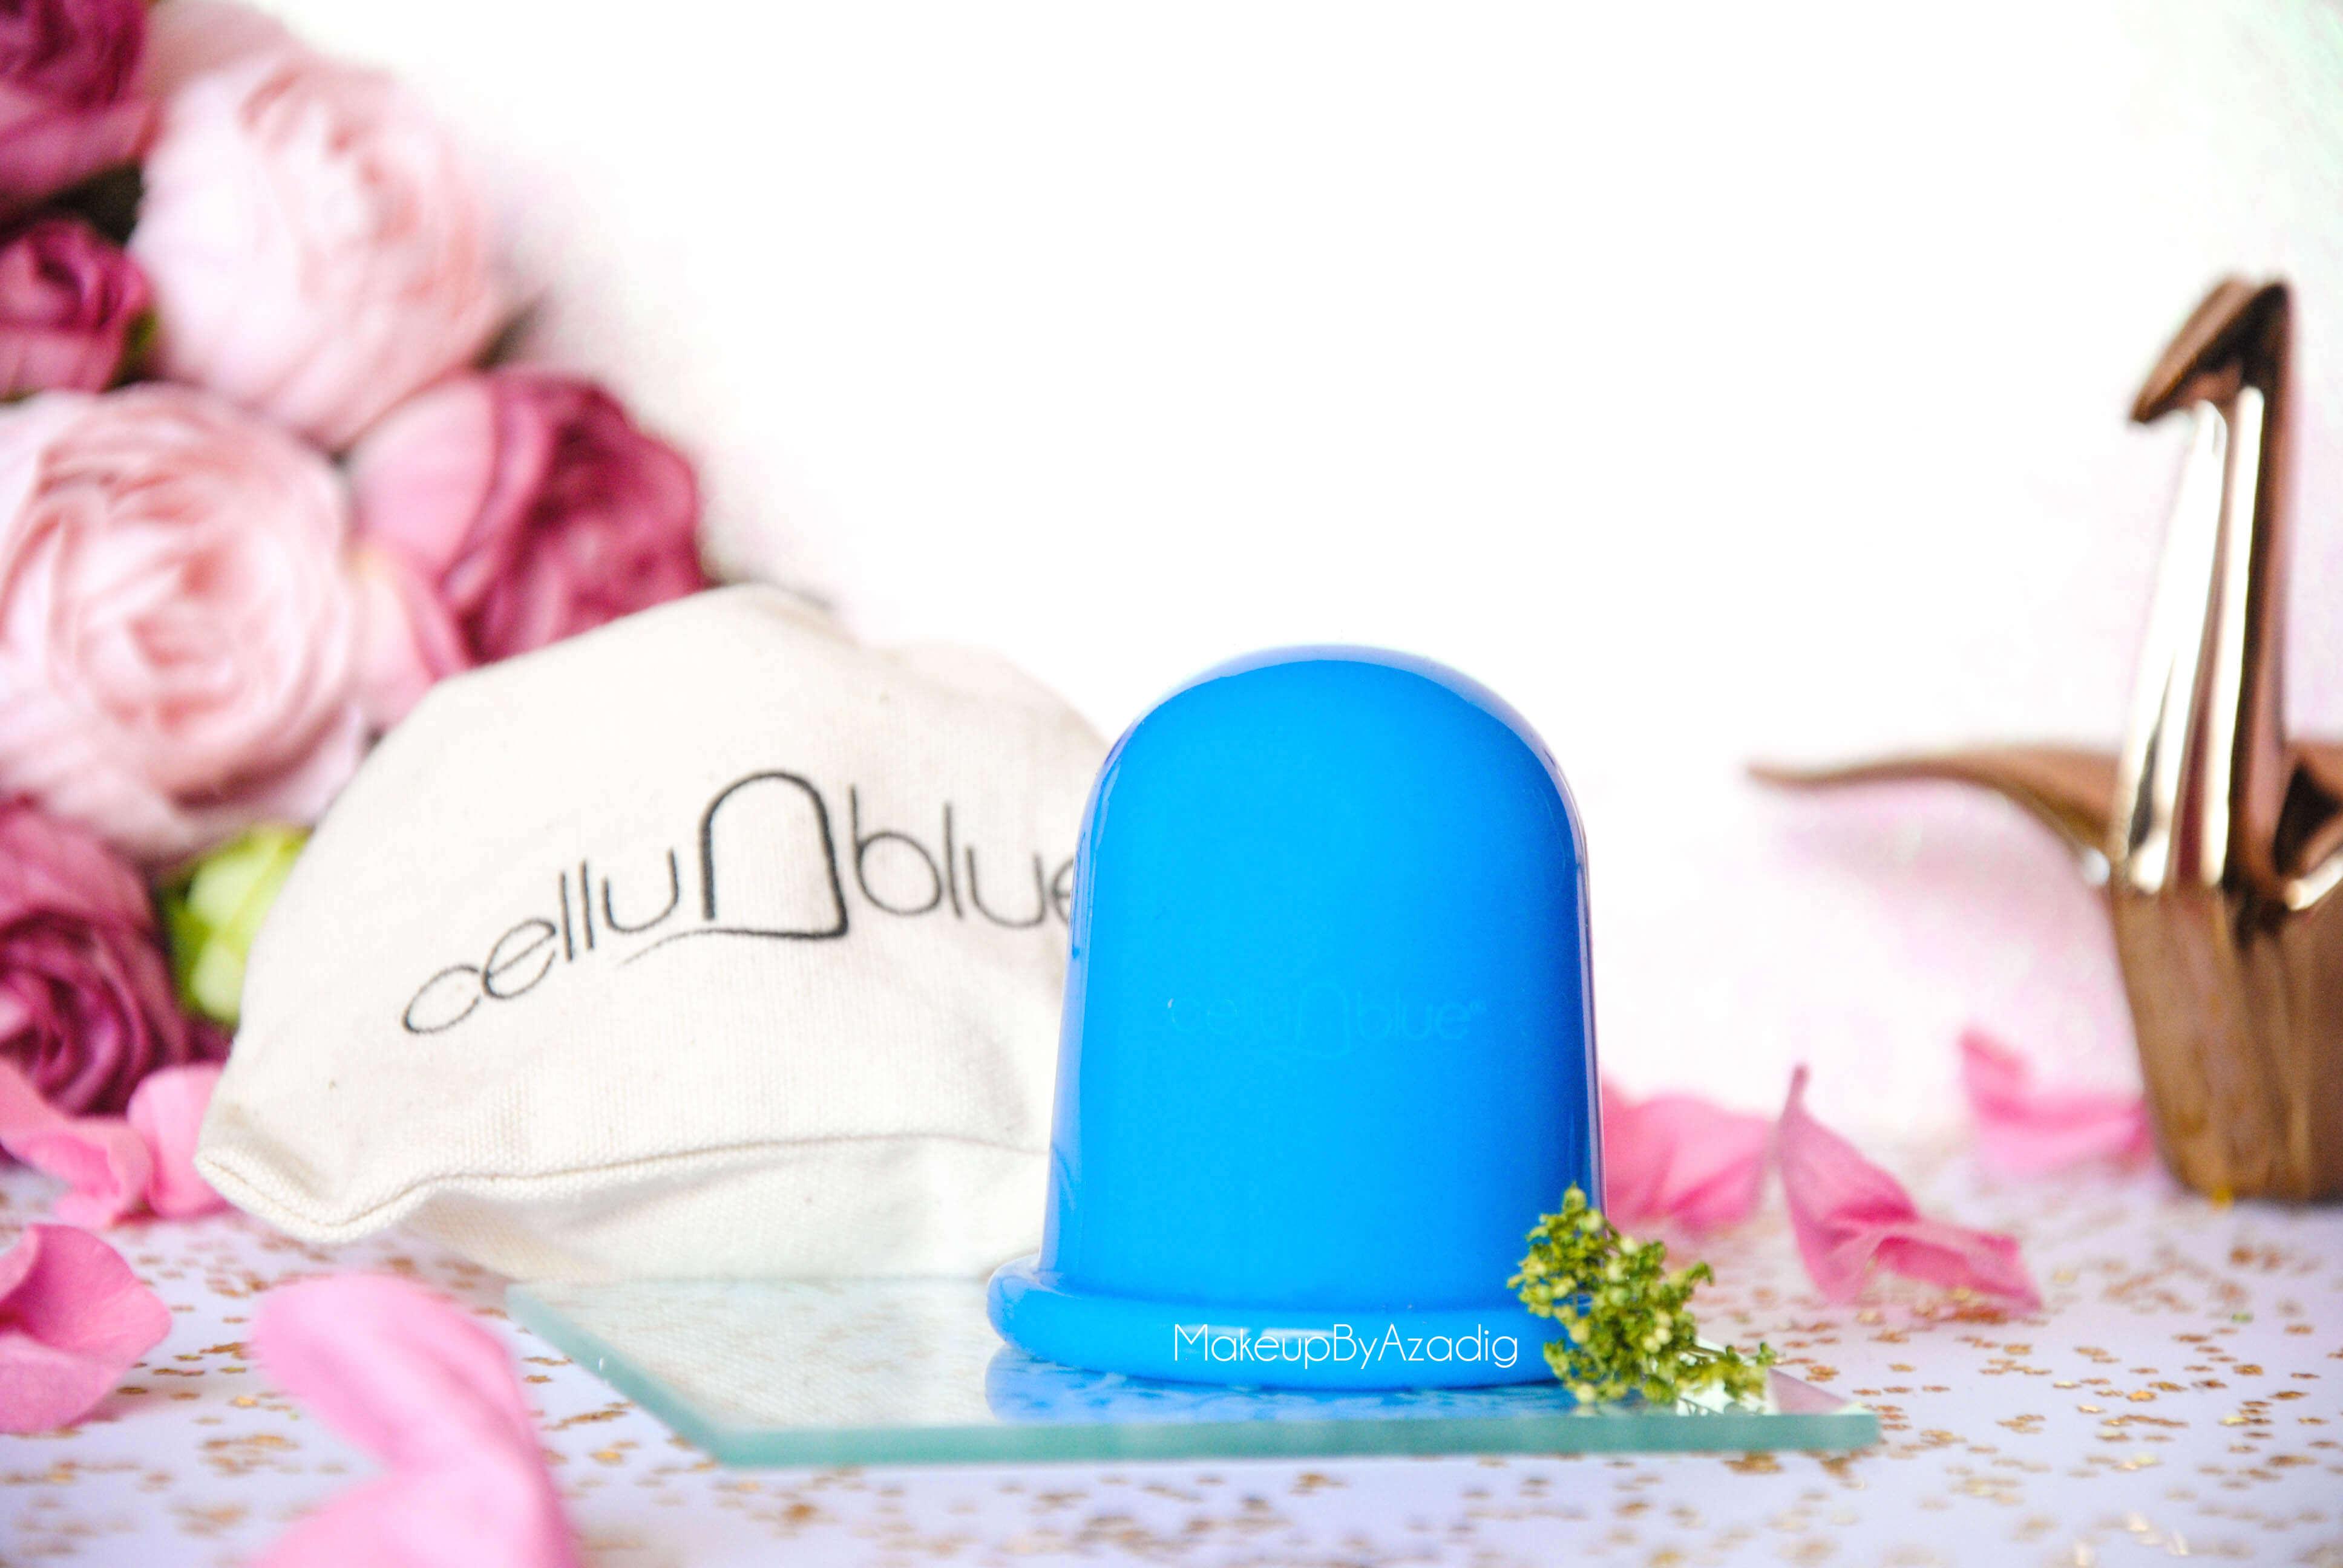 makeupbyazadig-cellublue-ventouse anti cellulite-avis-test